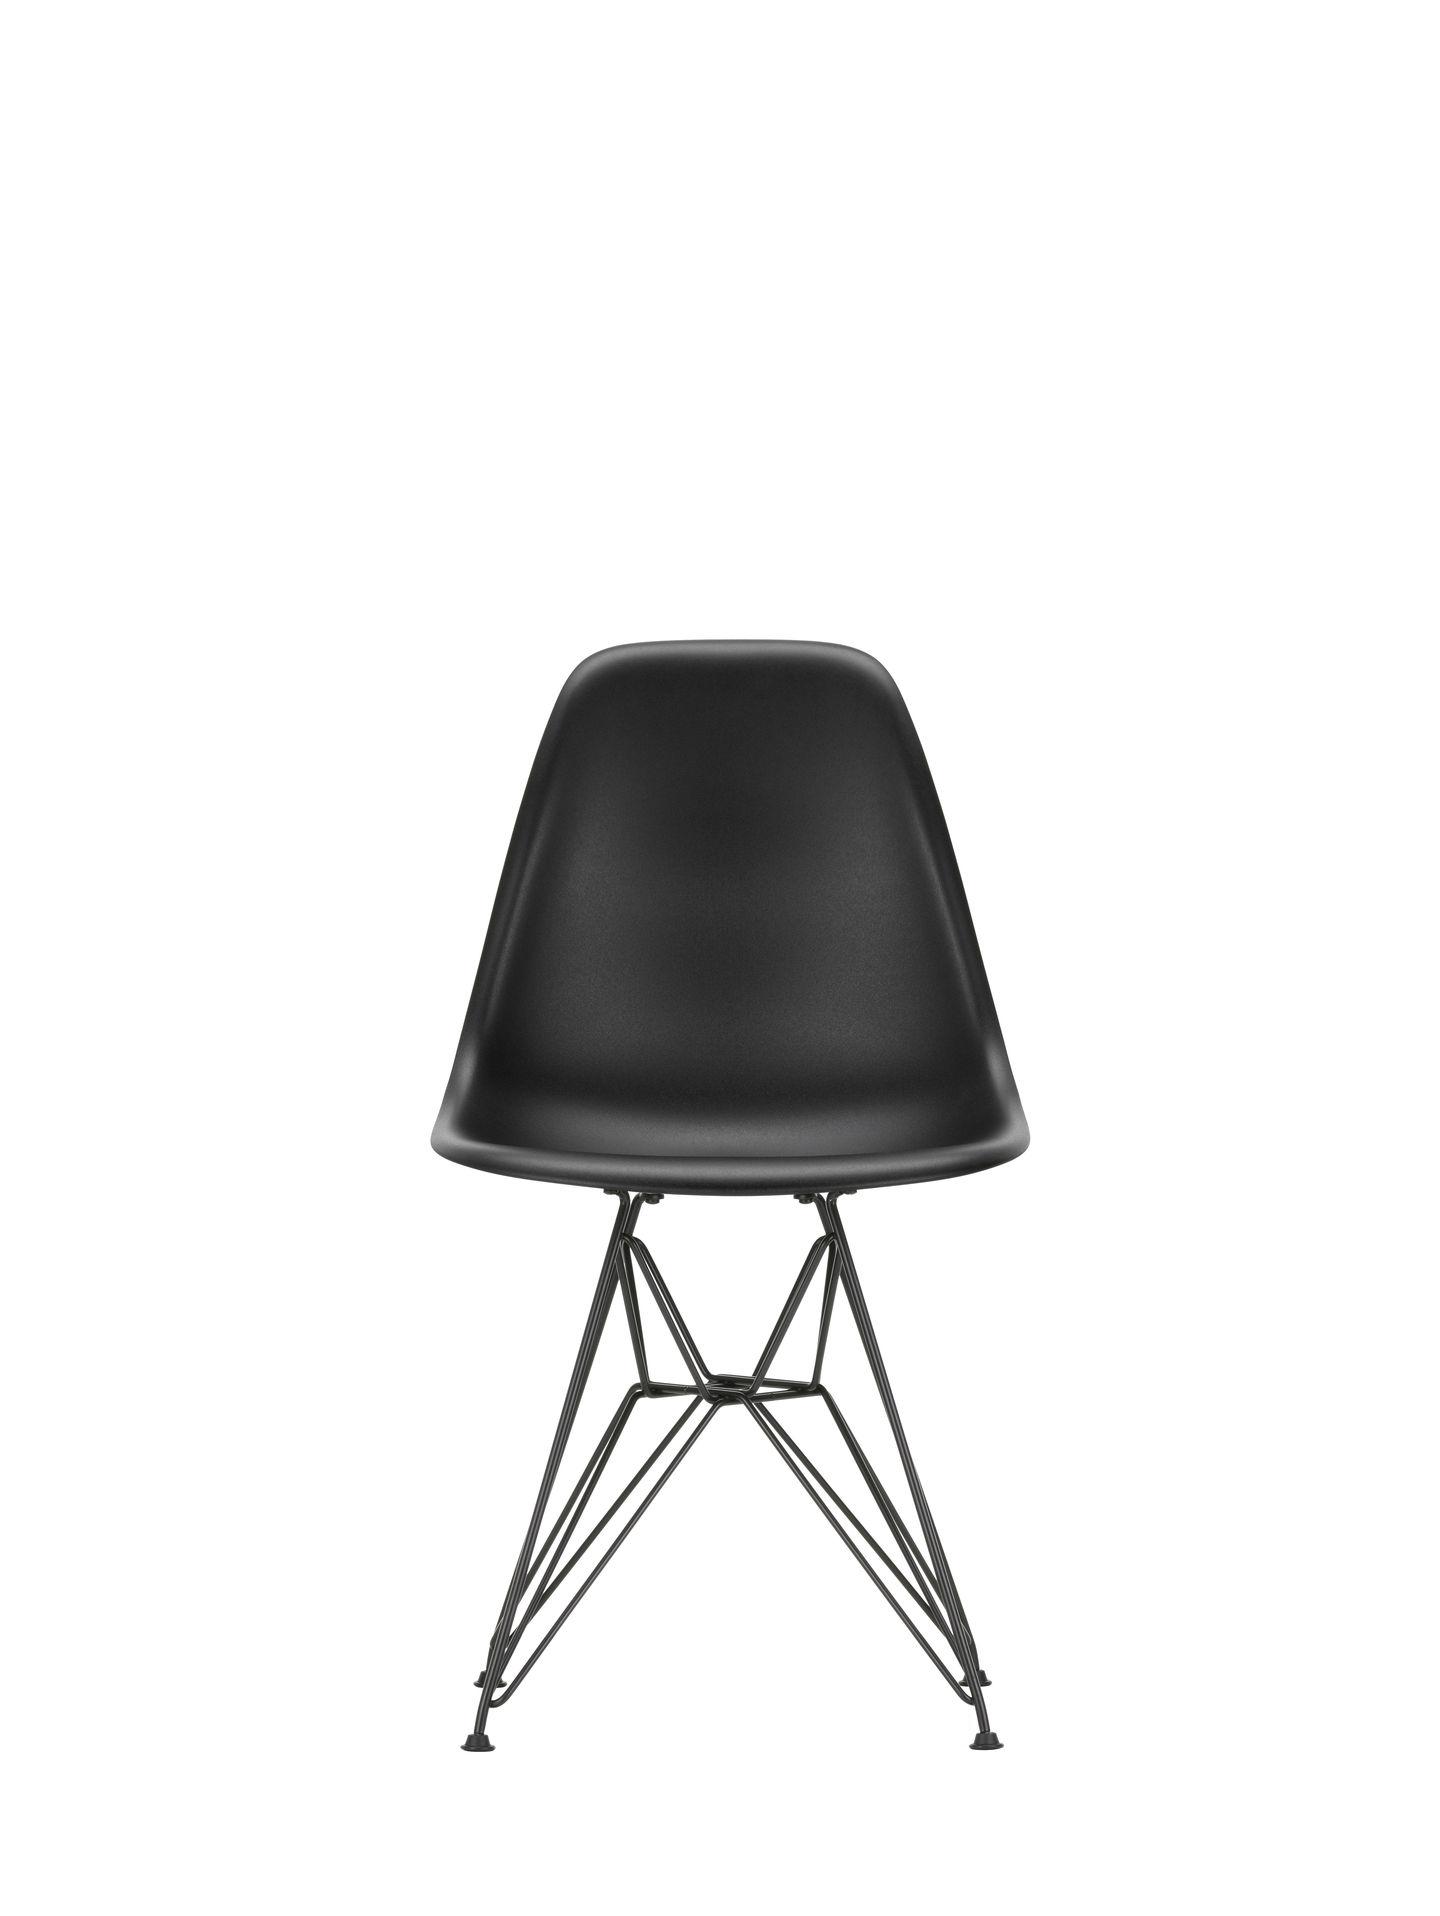 Vitra Eames Plastic Side Chair Dsr Charles Und Ray Eames Black Quickship Designikonen Designmobel Shop